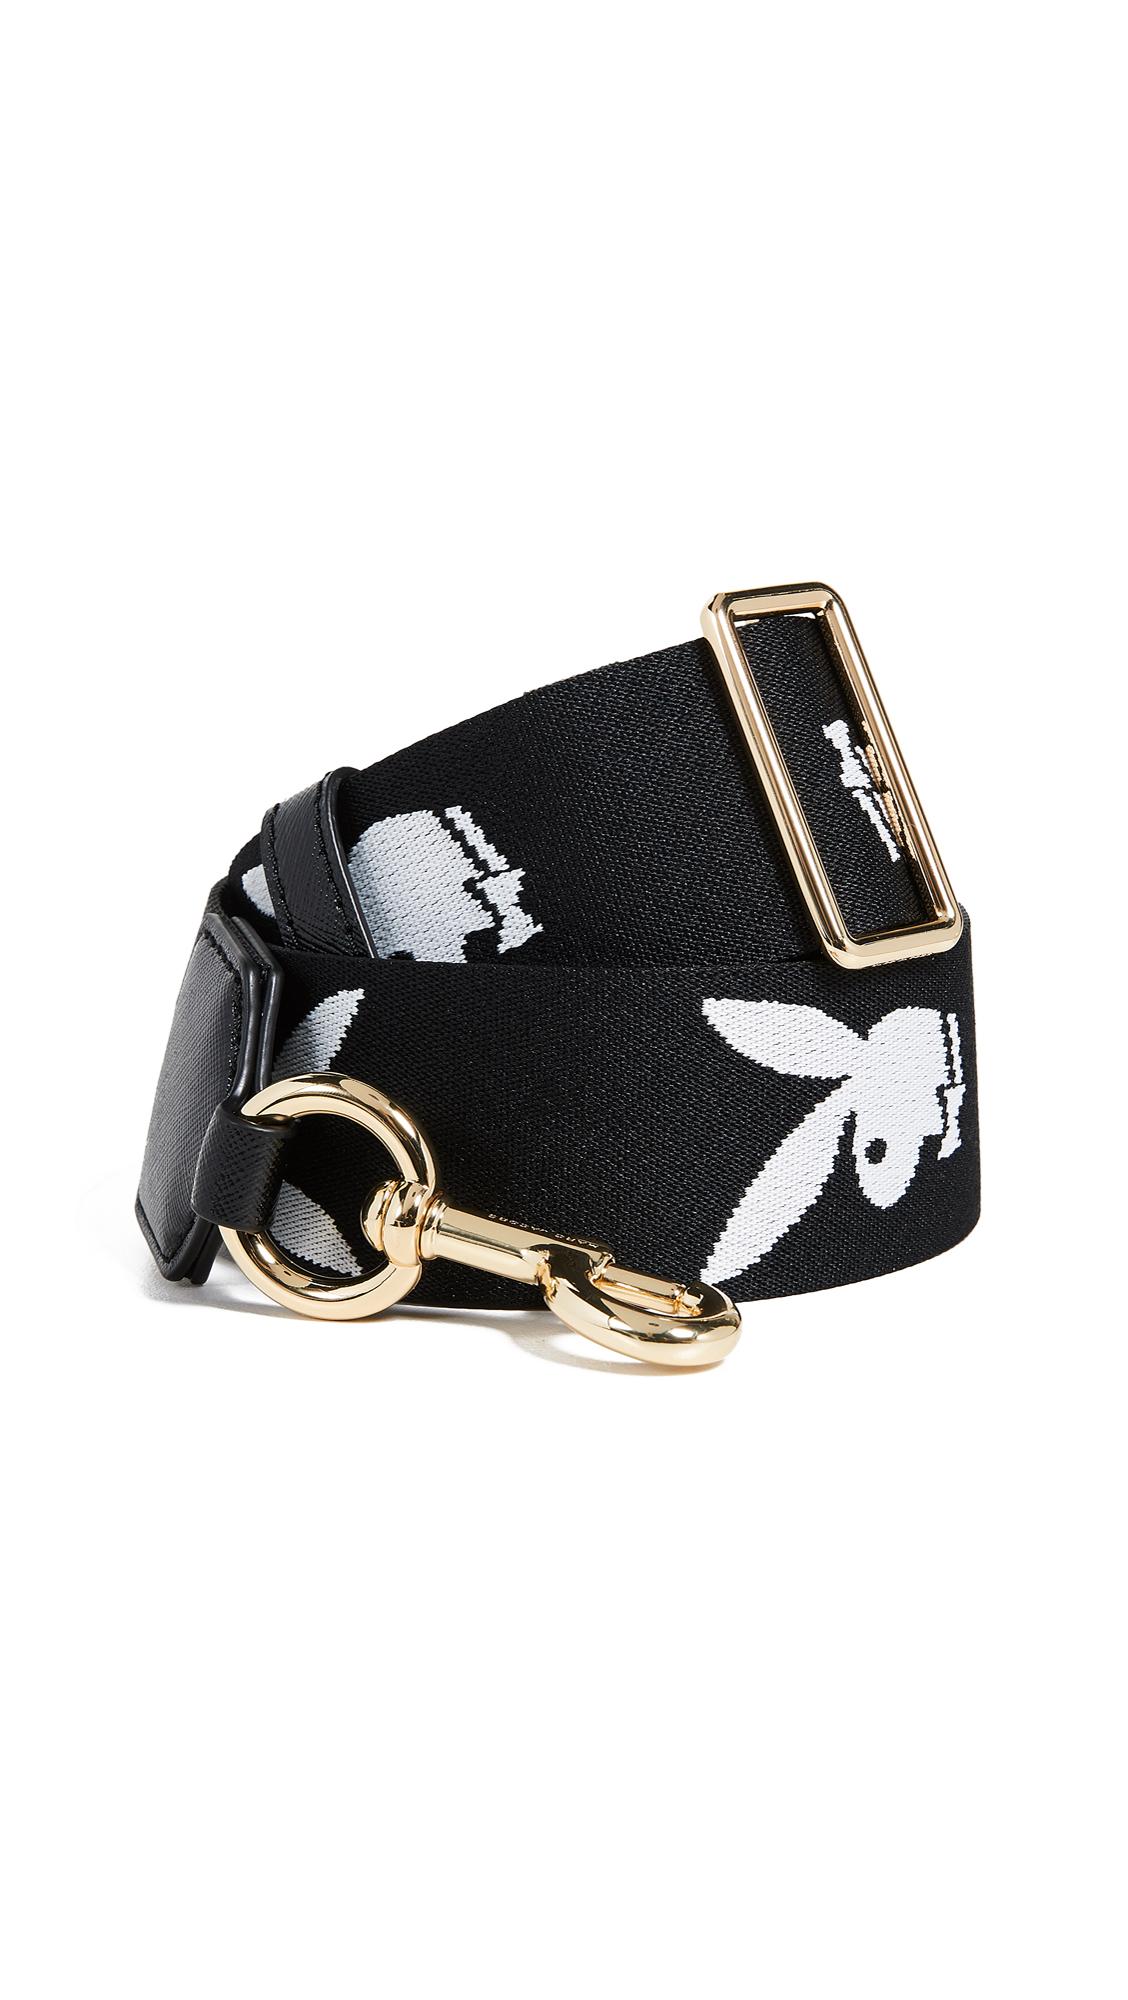 Marc Jacobs Playboy Webbing Handbag Strap In Black Multi